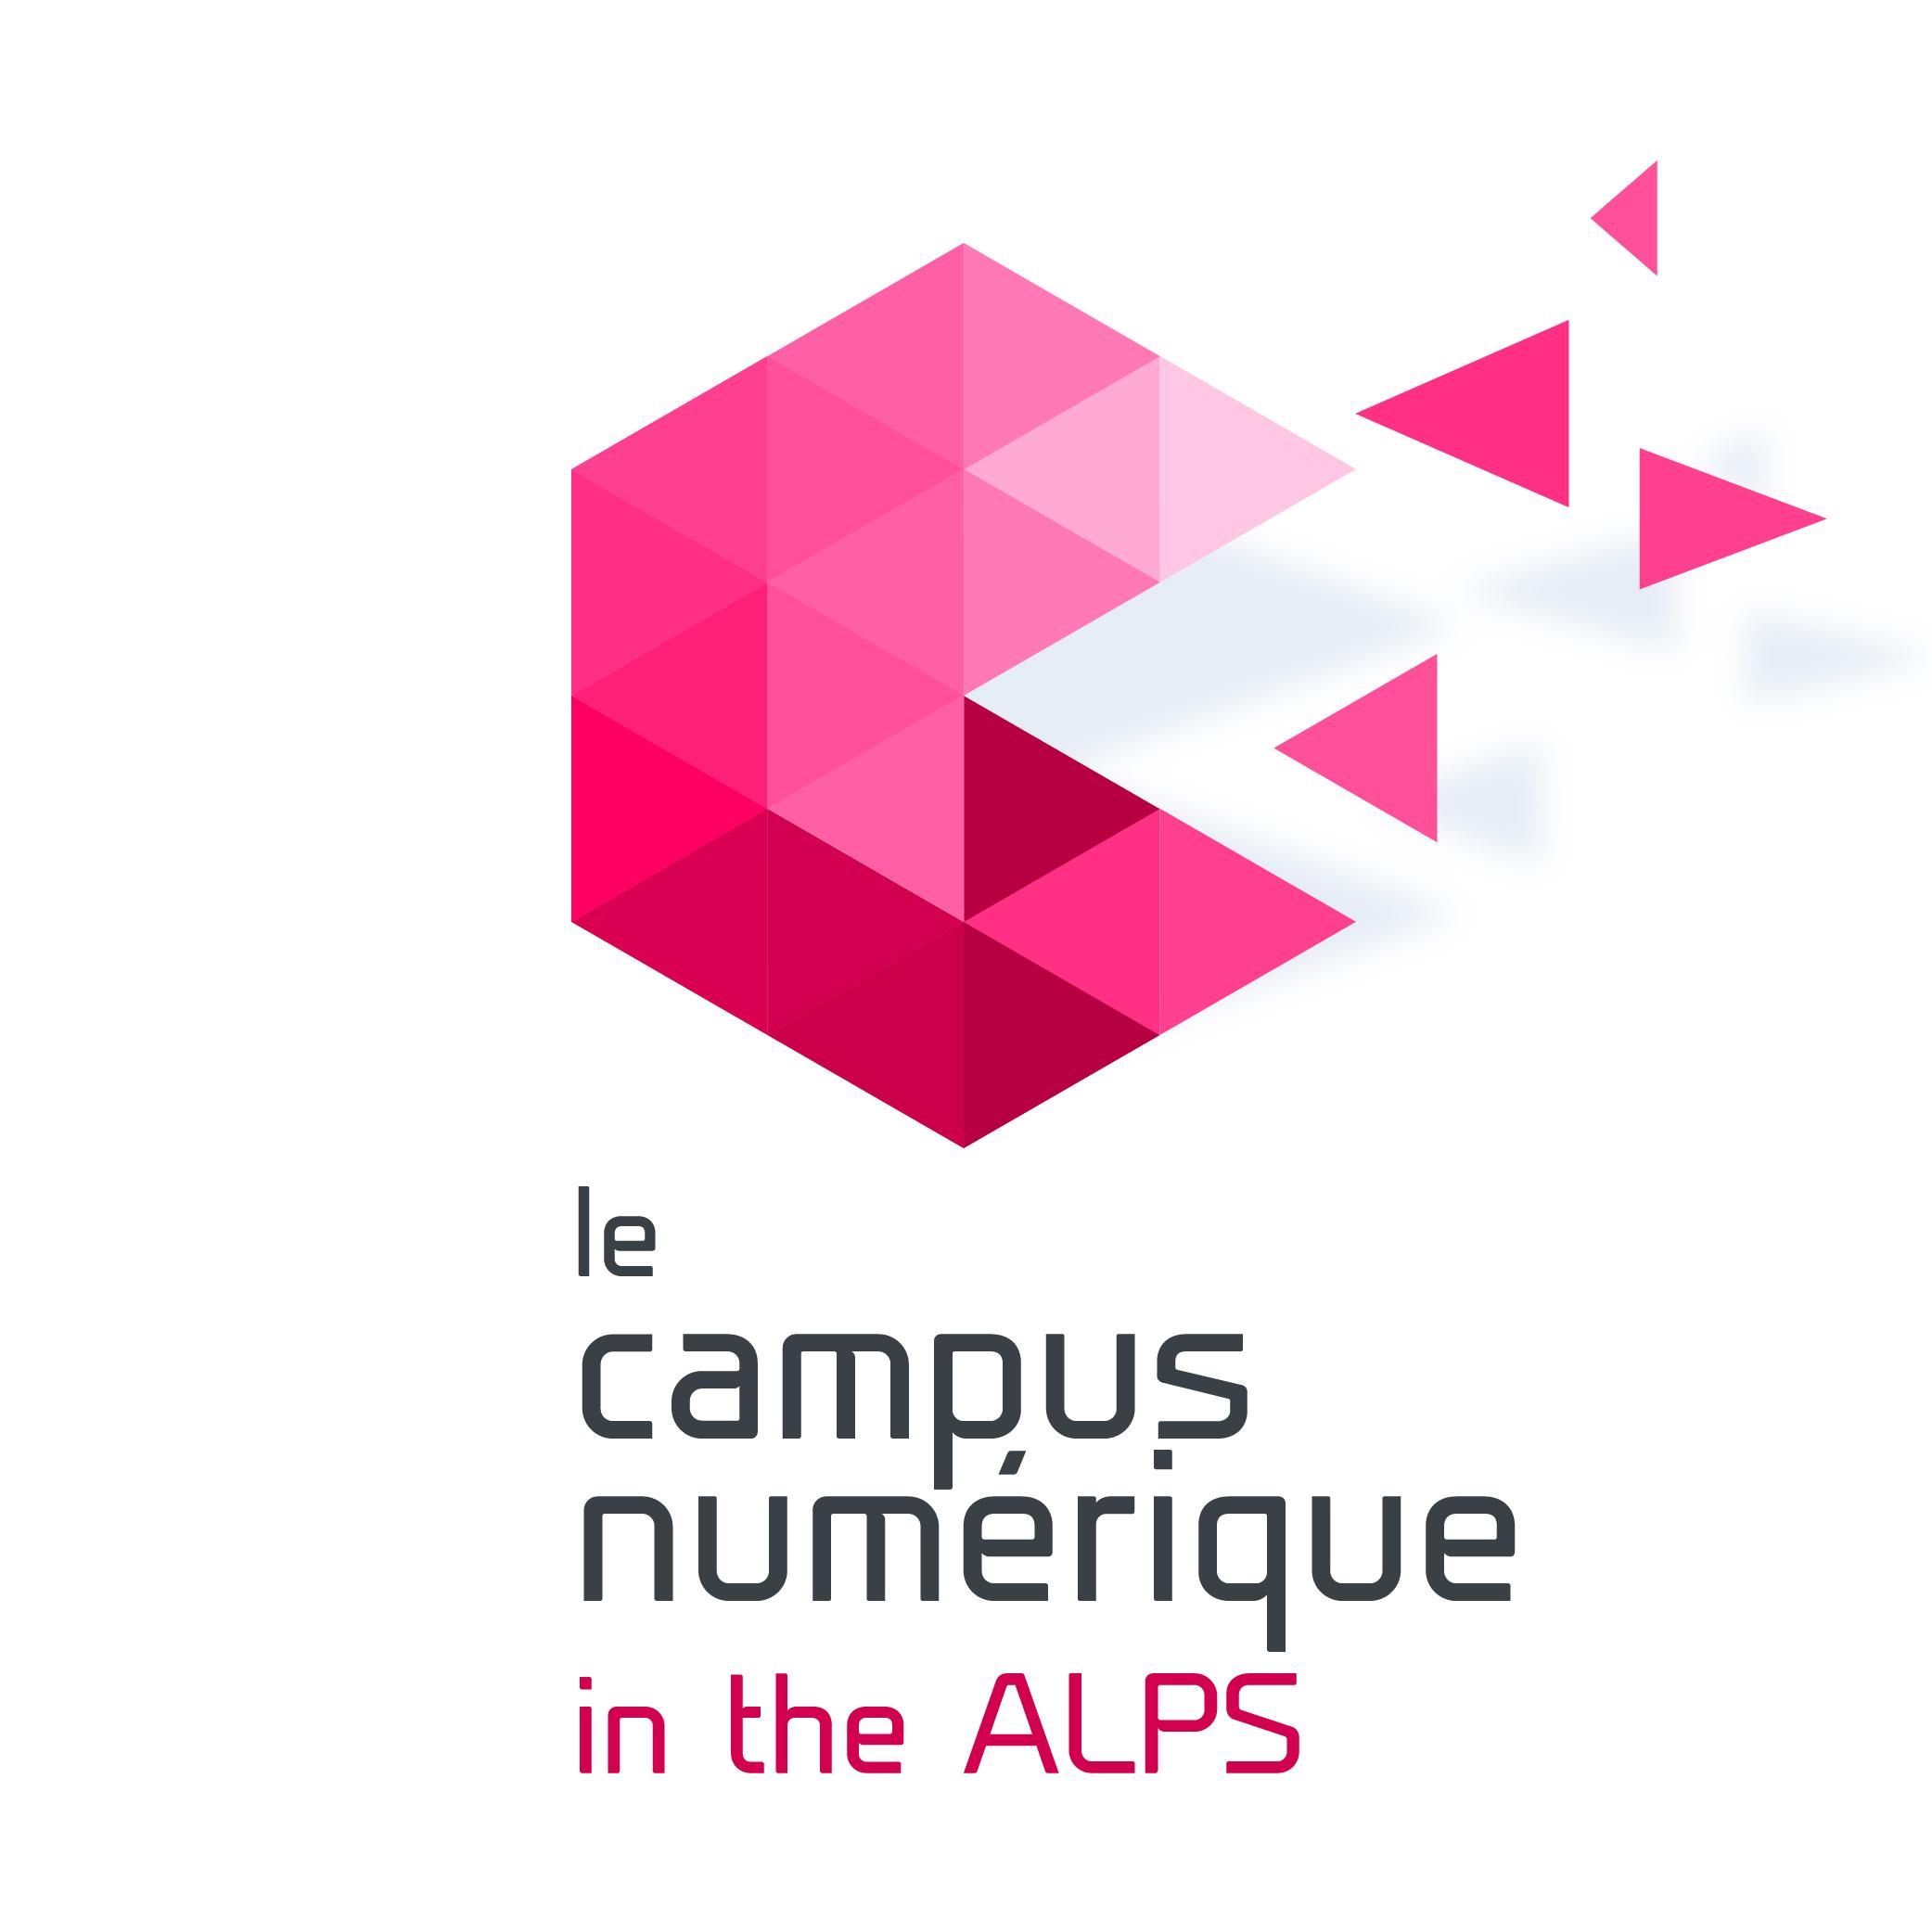 logo Campus numérique in the Alps